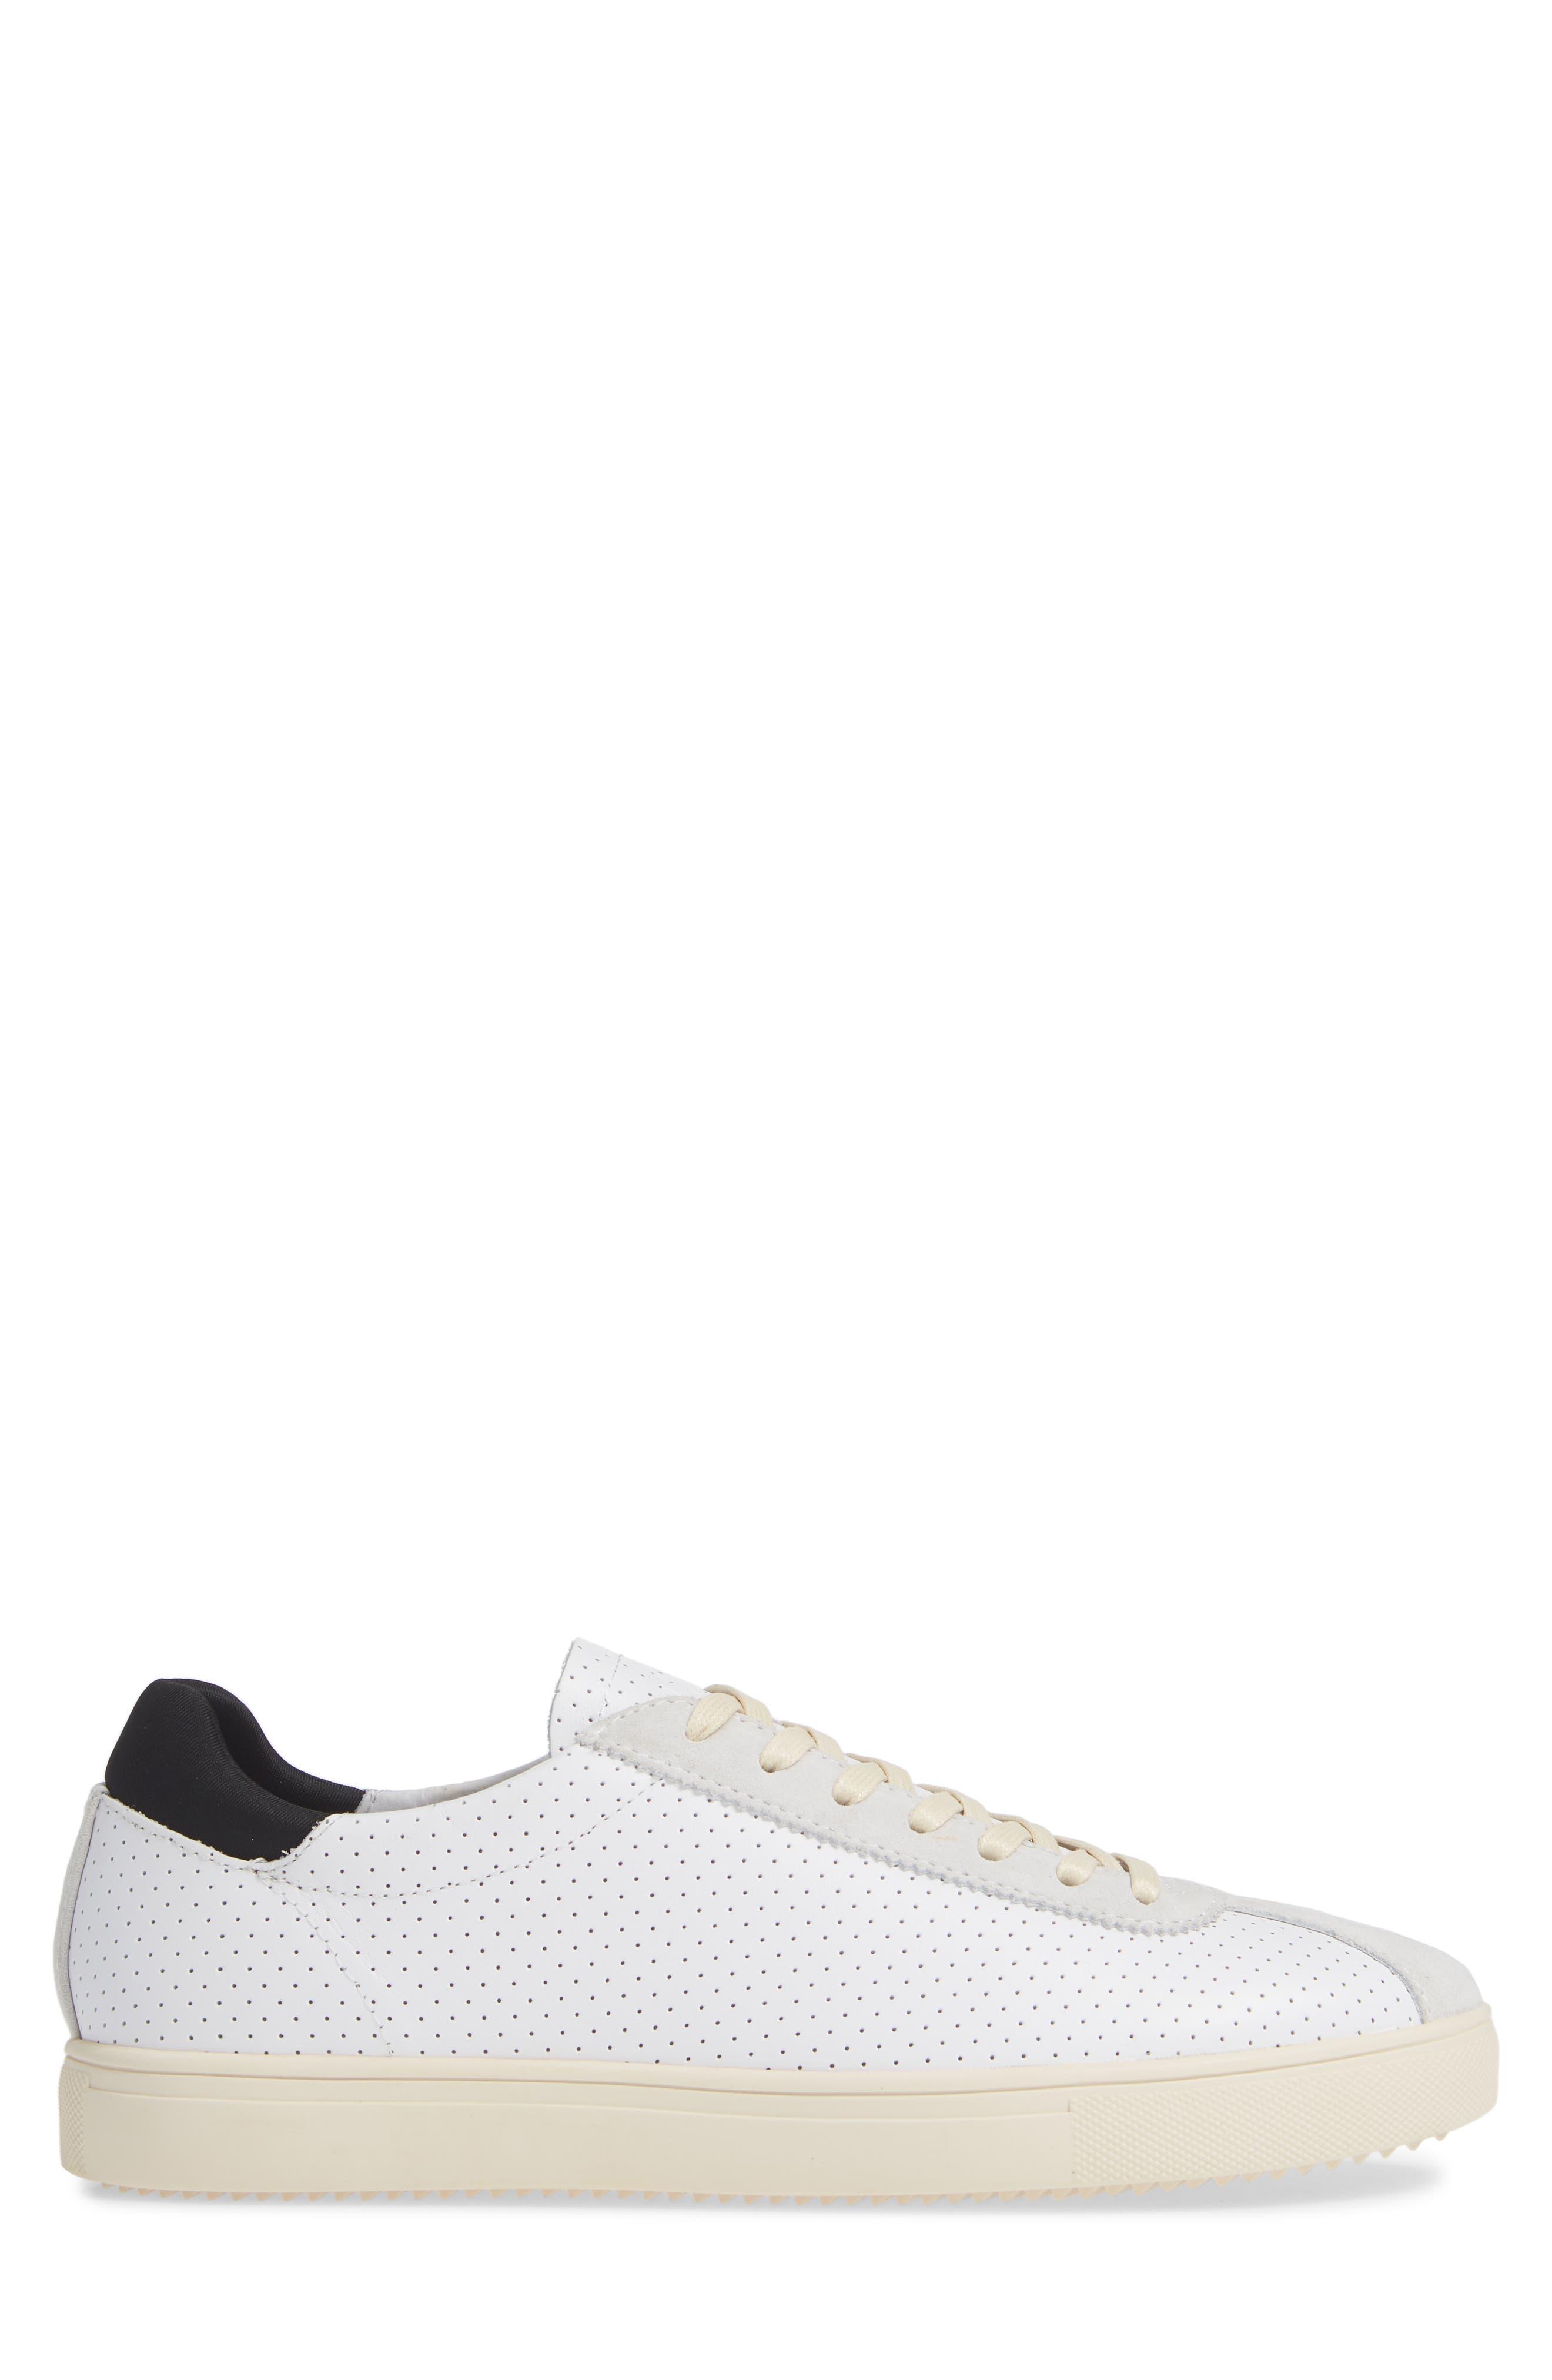 Noah Sneaker,                             Alternate thumbnail 3, color,                             WHITE LEATHER SUEDE CREAM